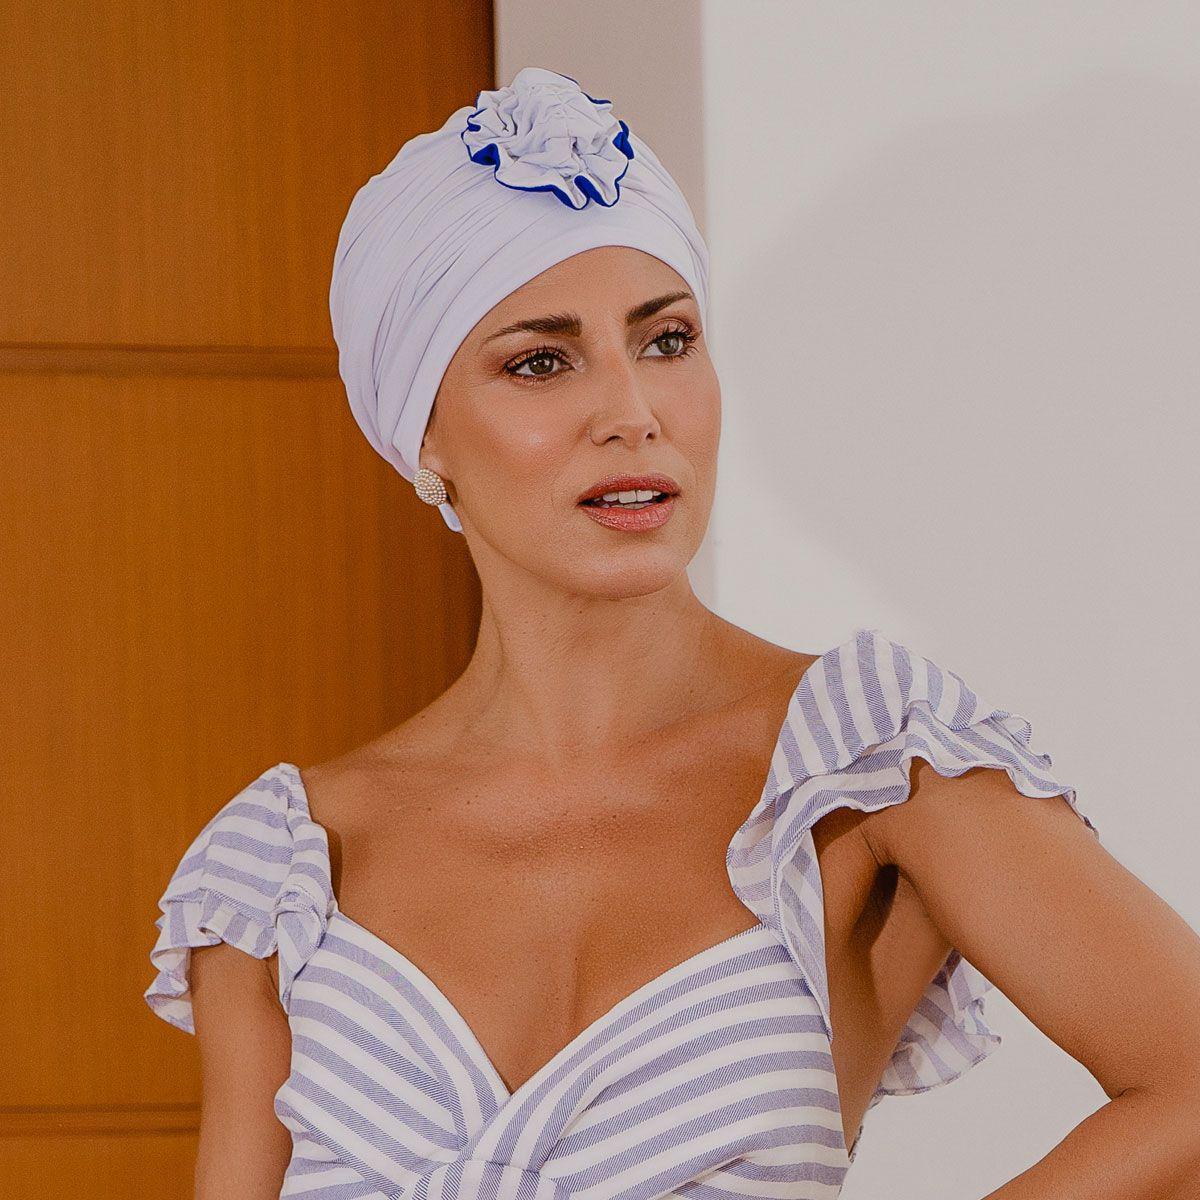 Turbante Feminino Fiore Branco com Azul Royal